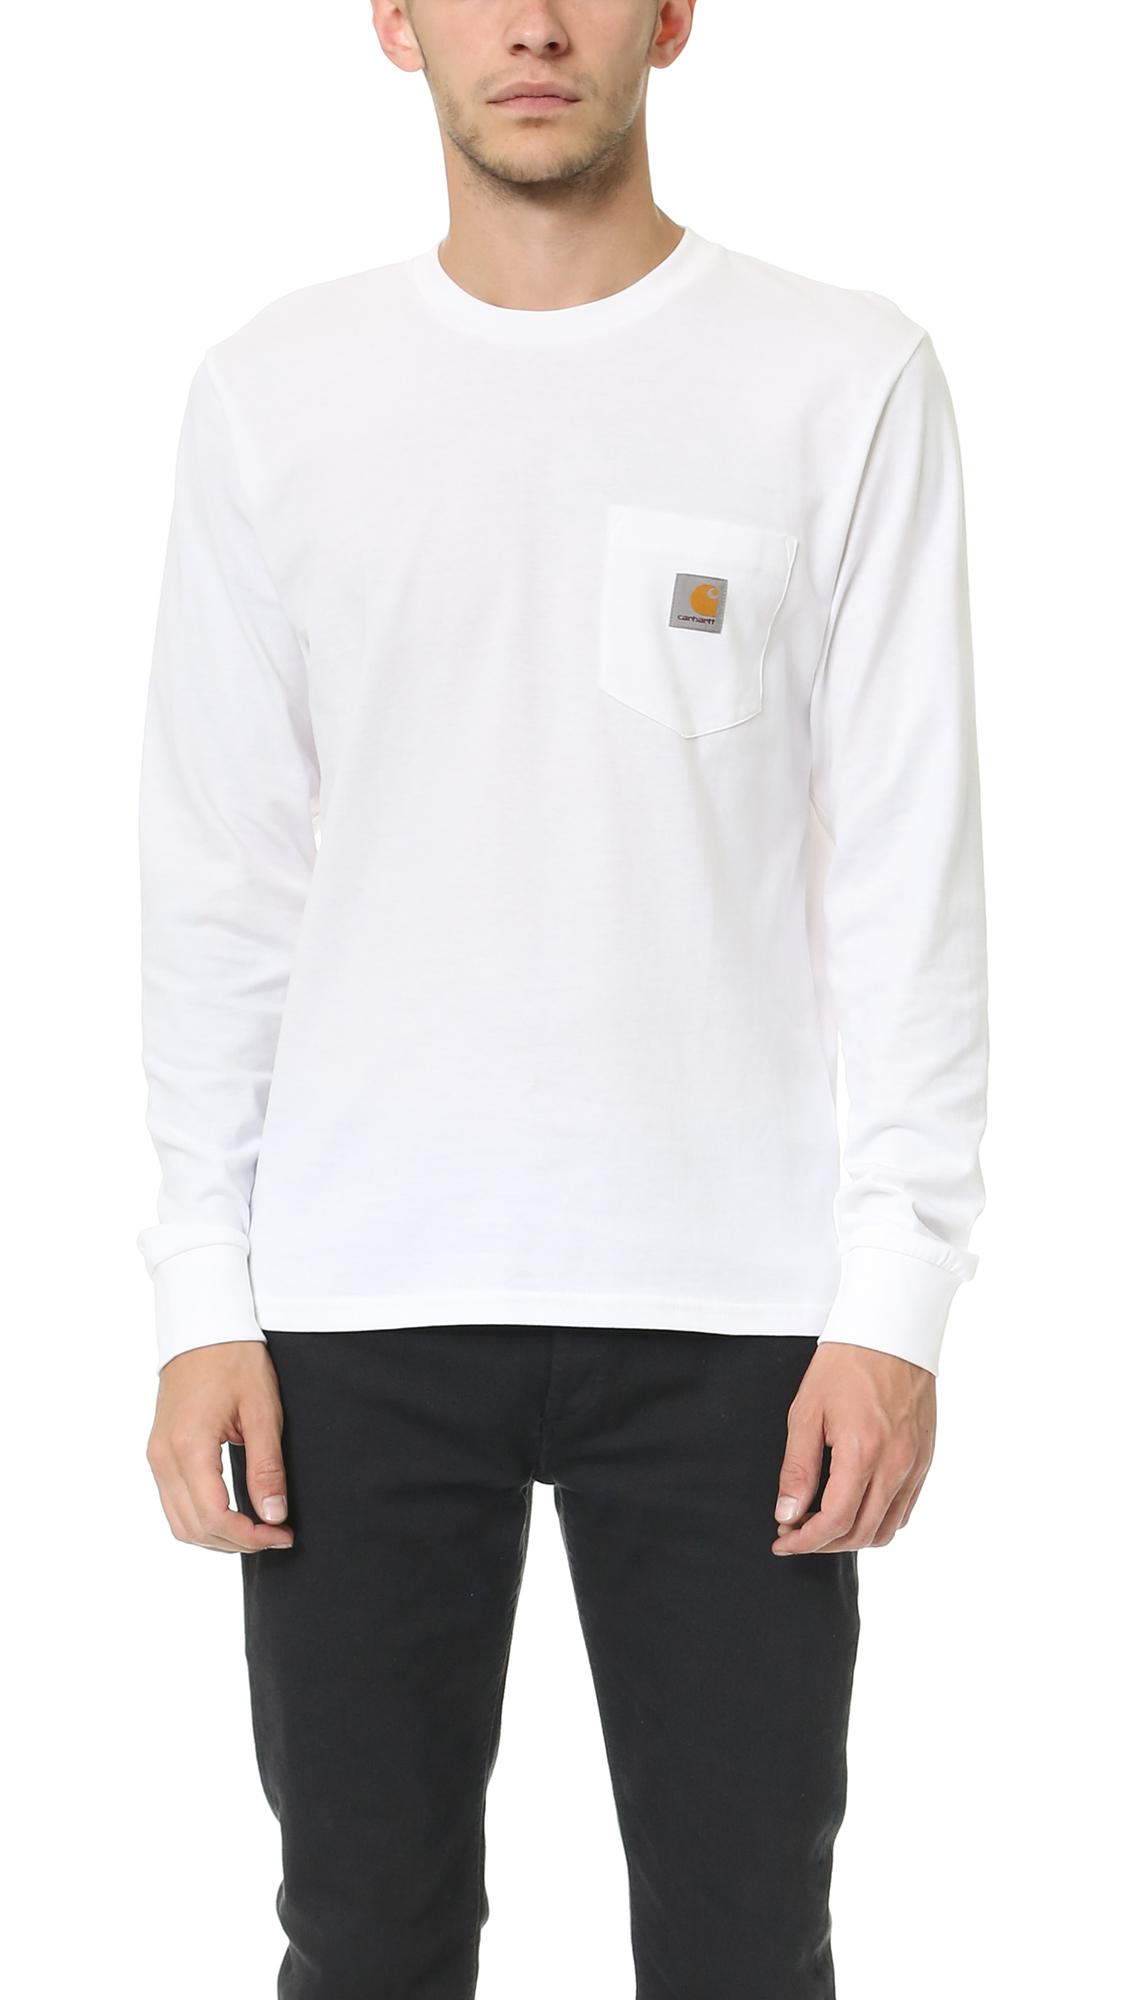 c1db012593f6 Mens Carhartt Long Sleeve T Shirts